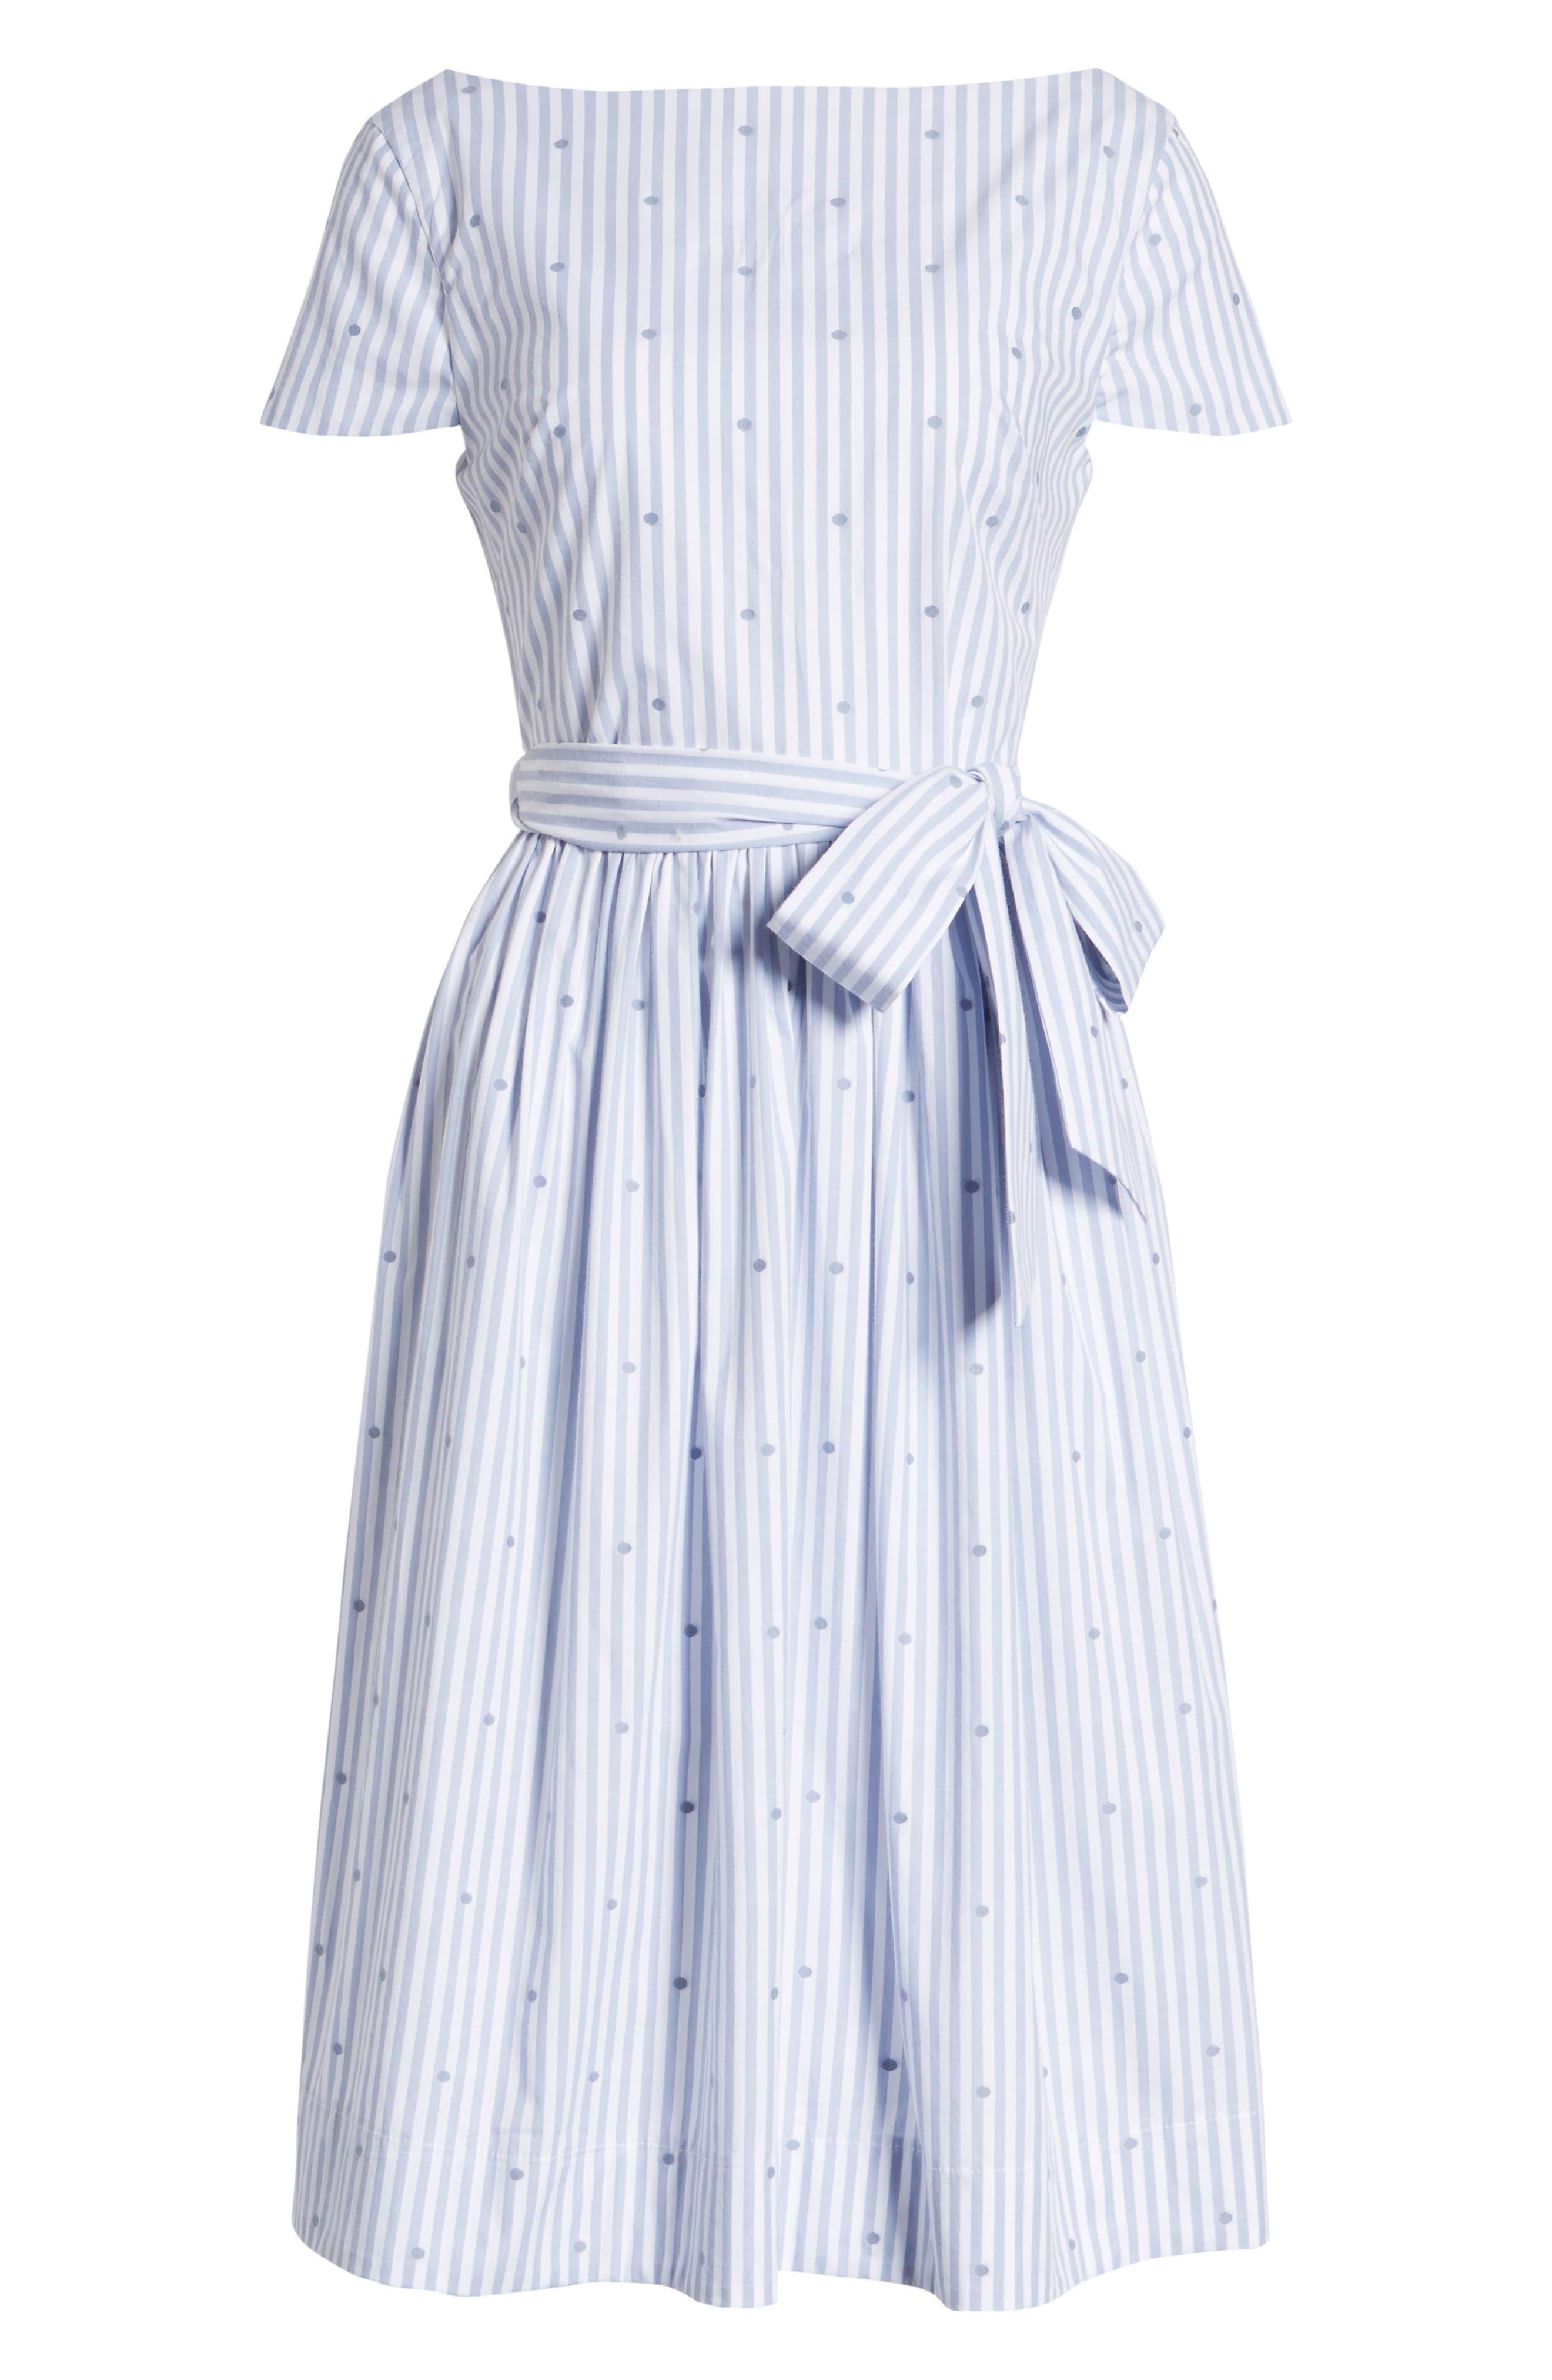 Stripe & Dot Cotton Dress,                             Alternate thumbnail 6, color,                             Eve Dot Stripe